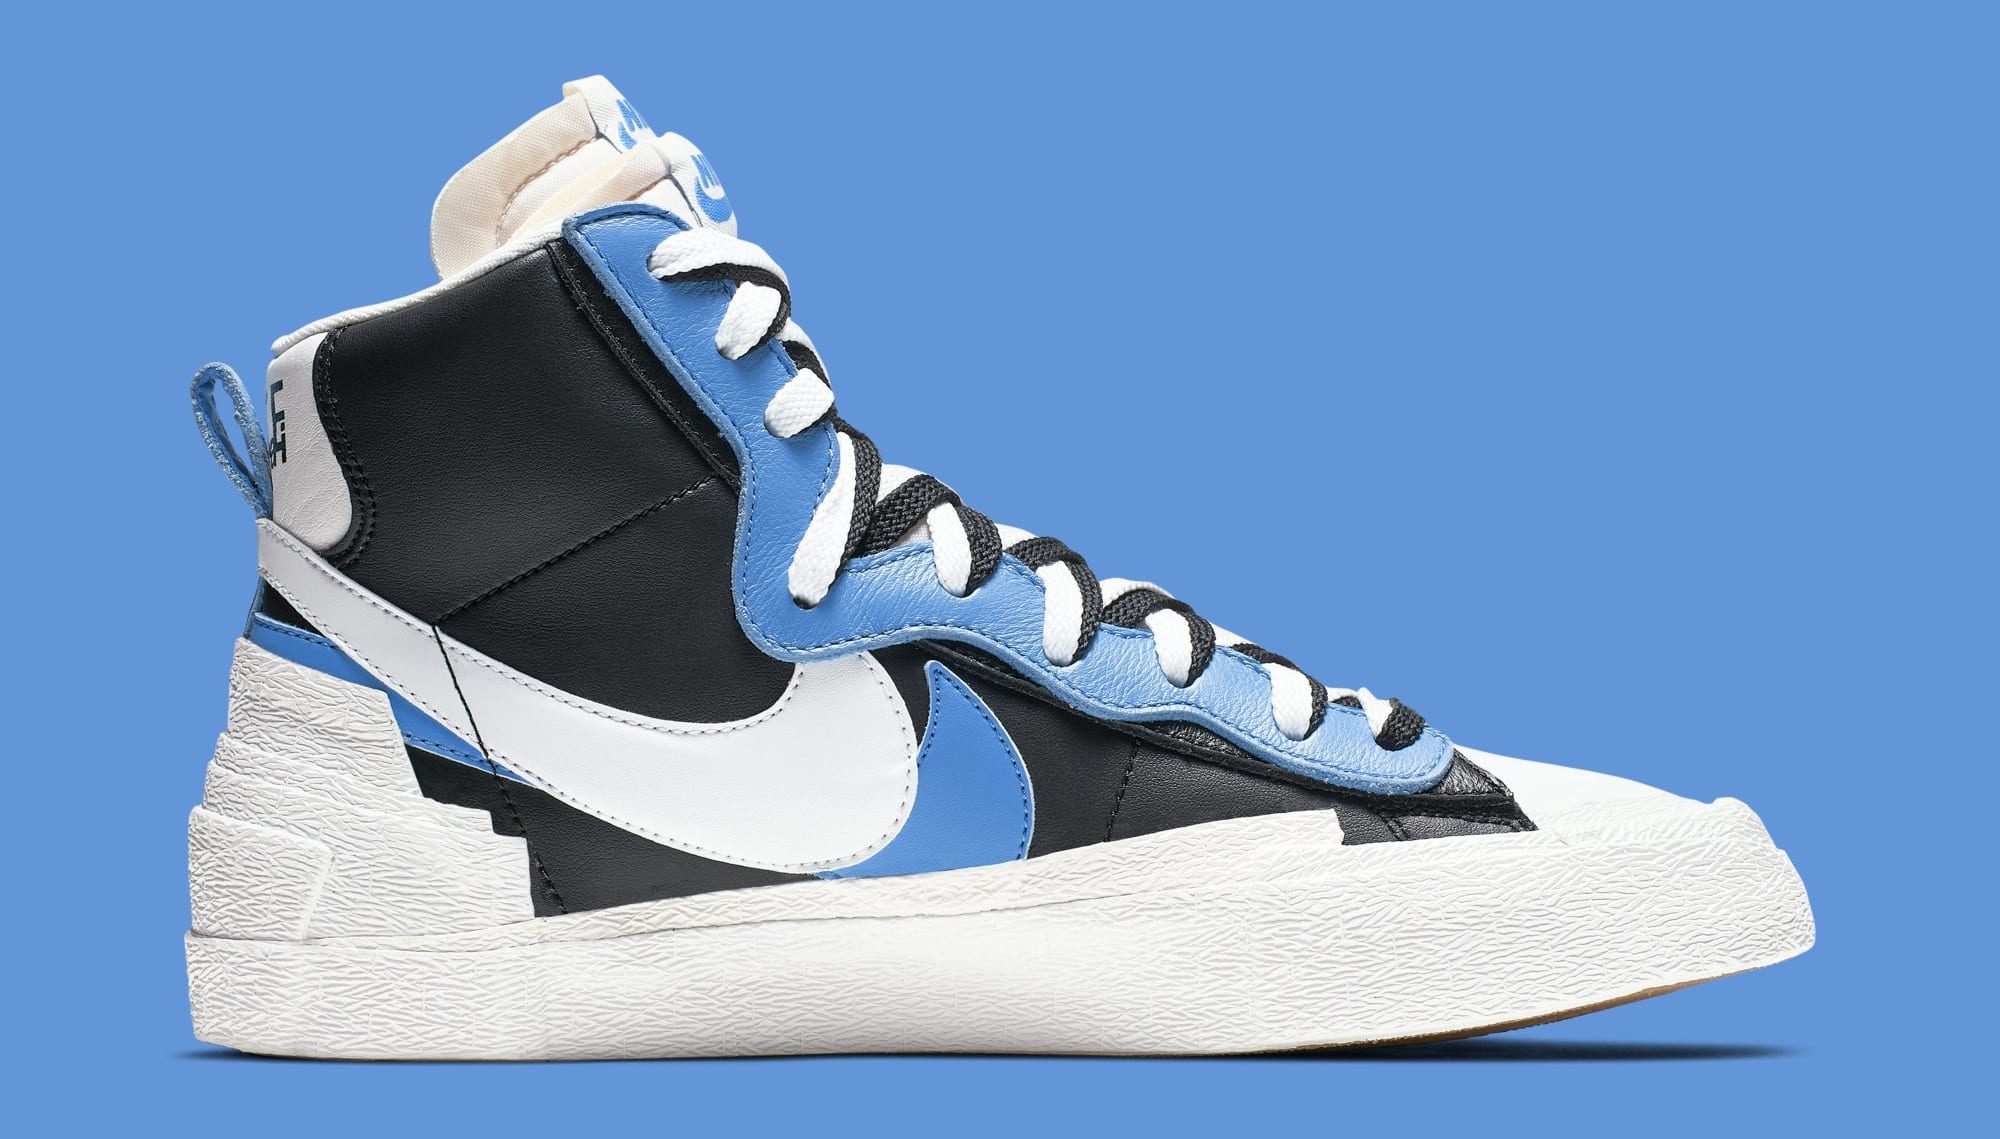 Sacai x Nike Blazer High BV0072 001 BV0072 700 Collection